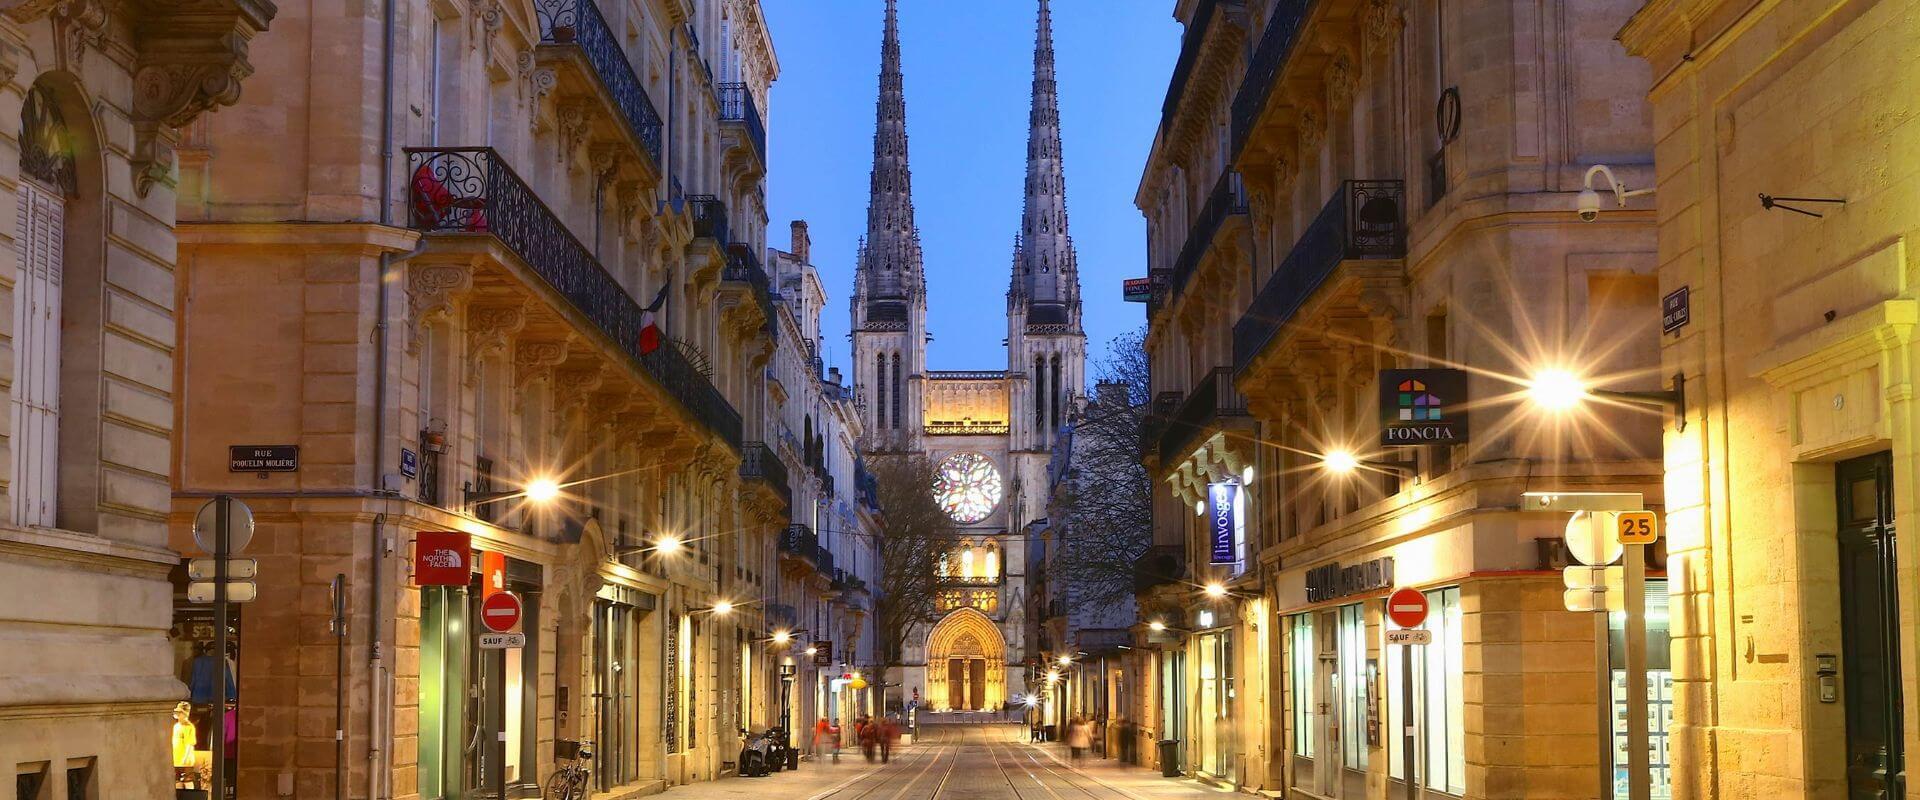 Städtereise nach Bordeaux